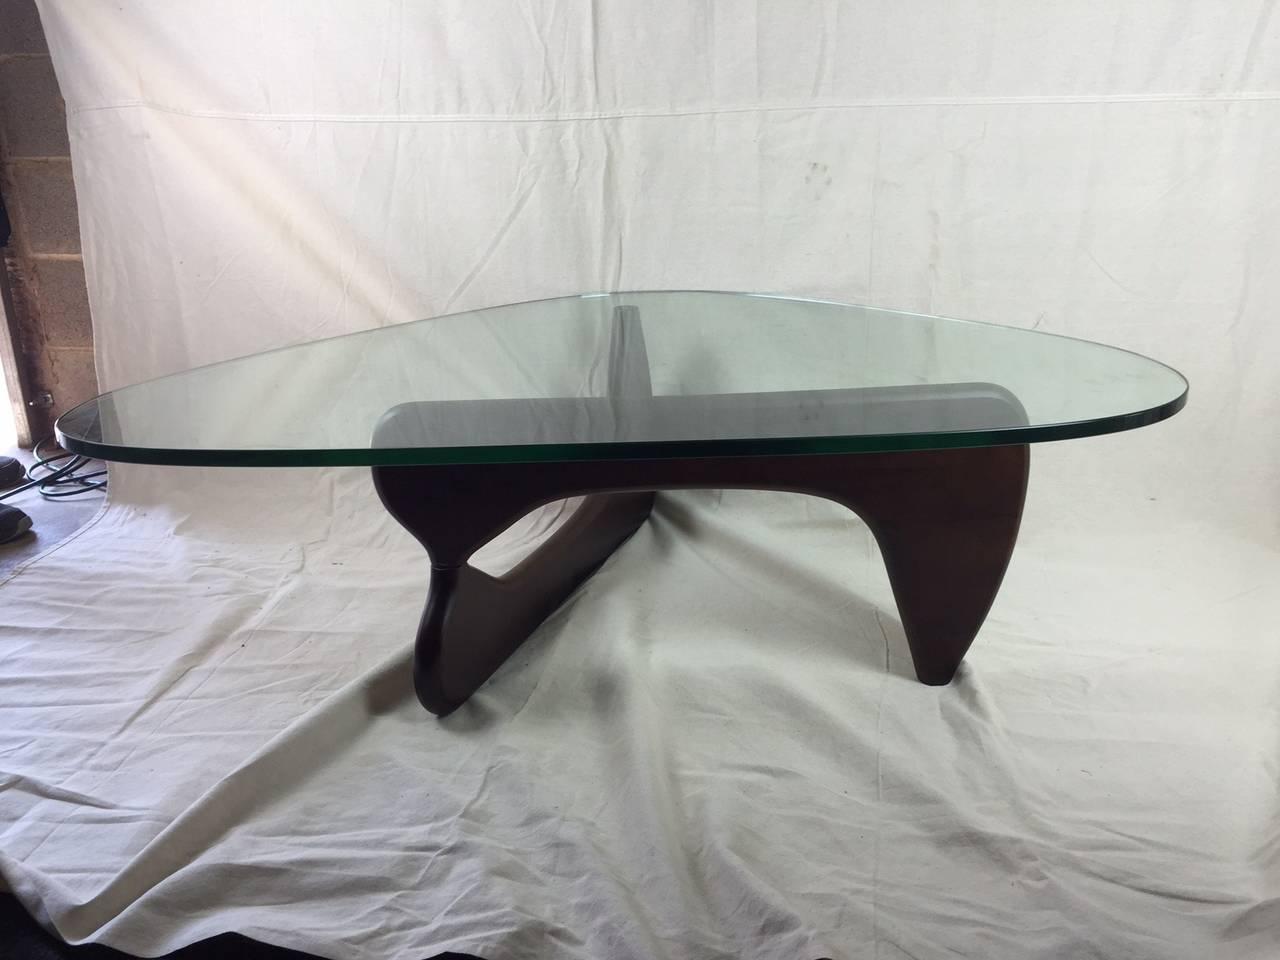 Isamhu Noguchi Inspired Glass Coffee Table At 1stdibs